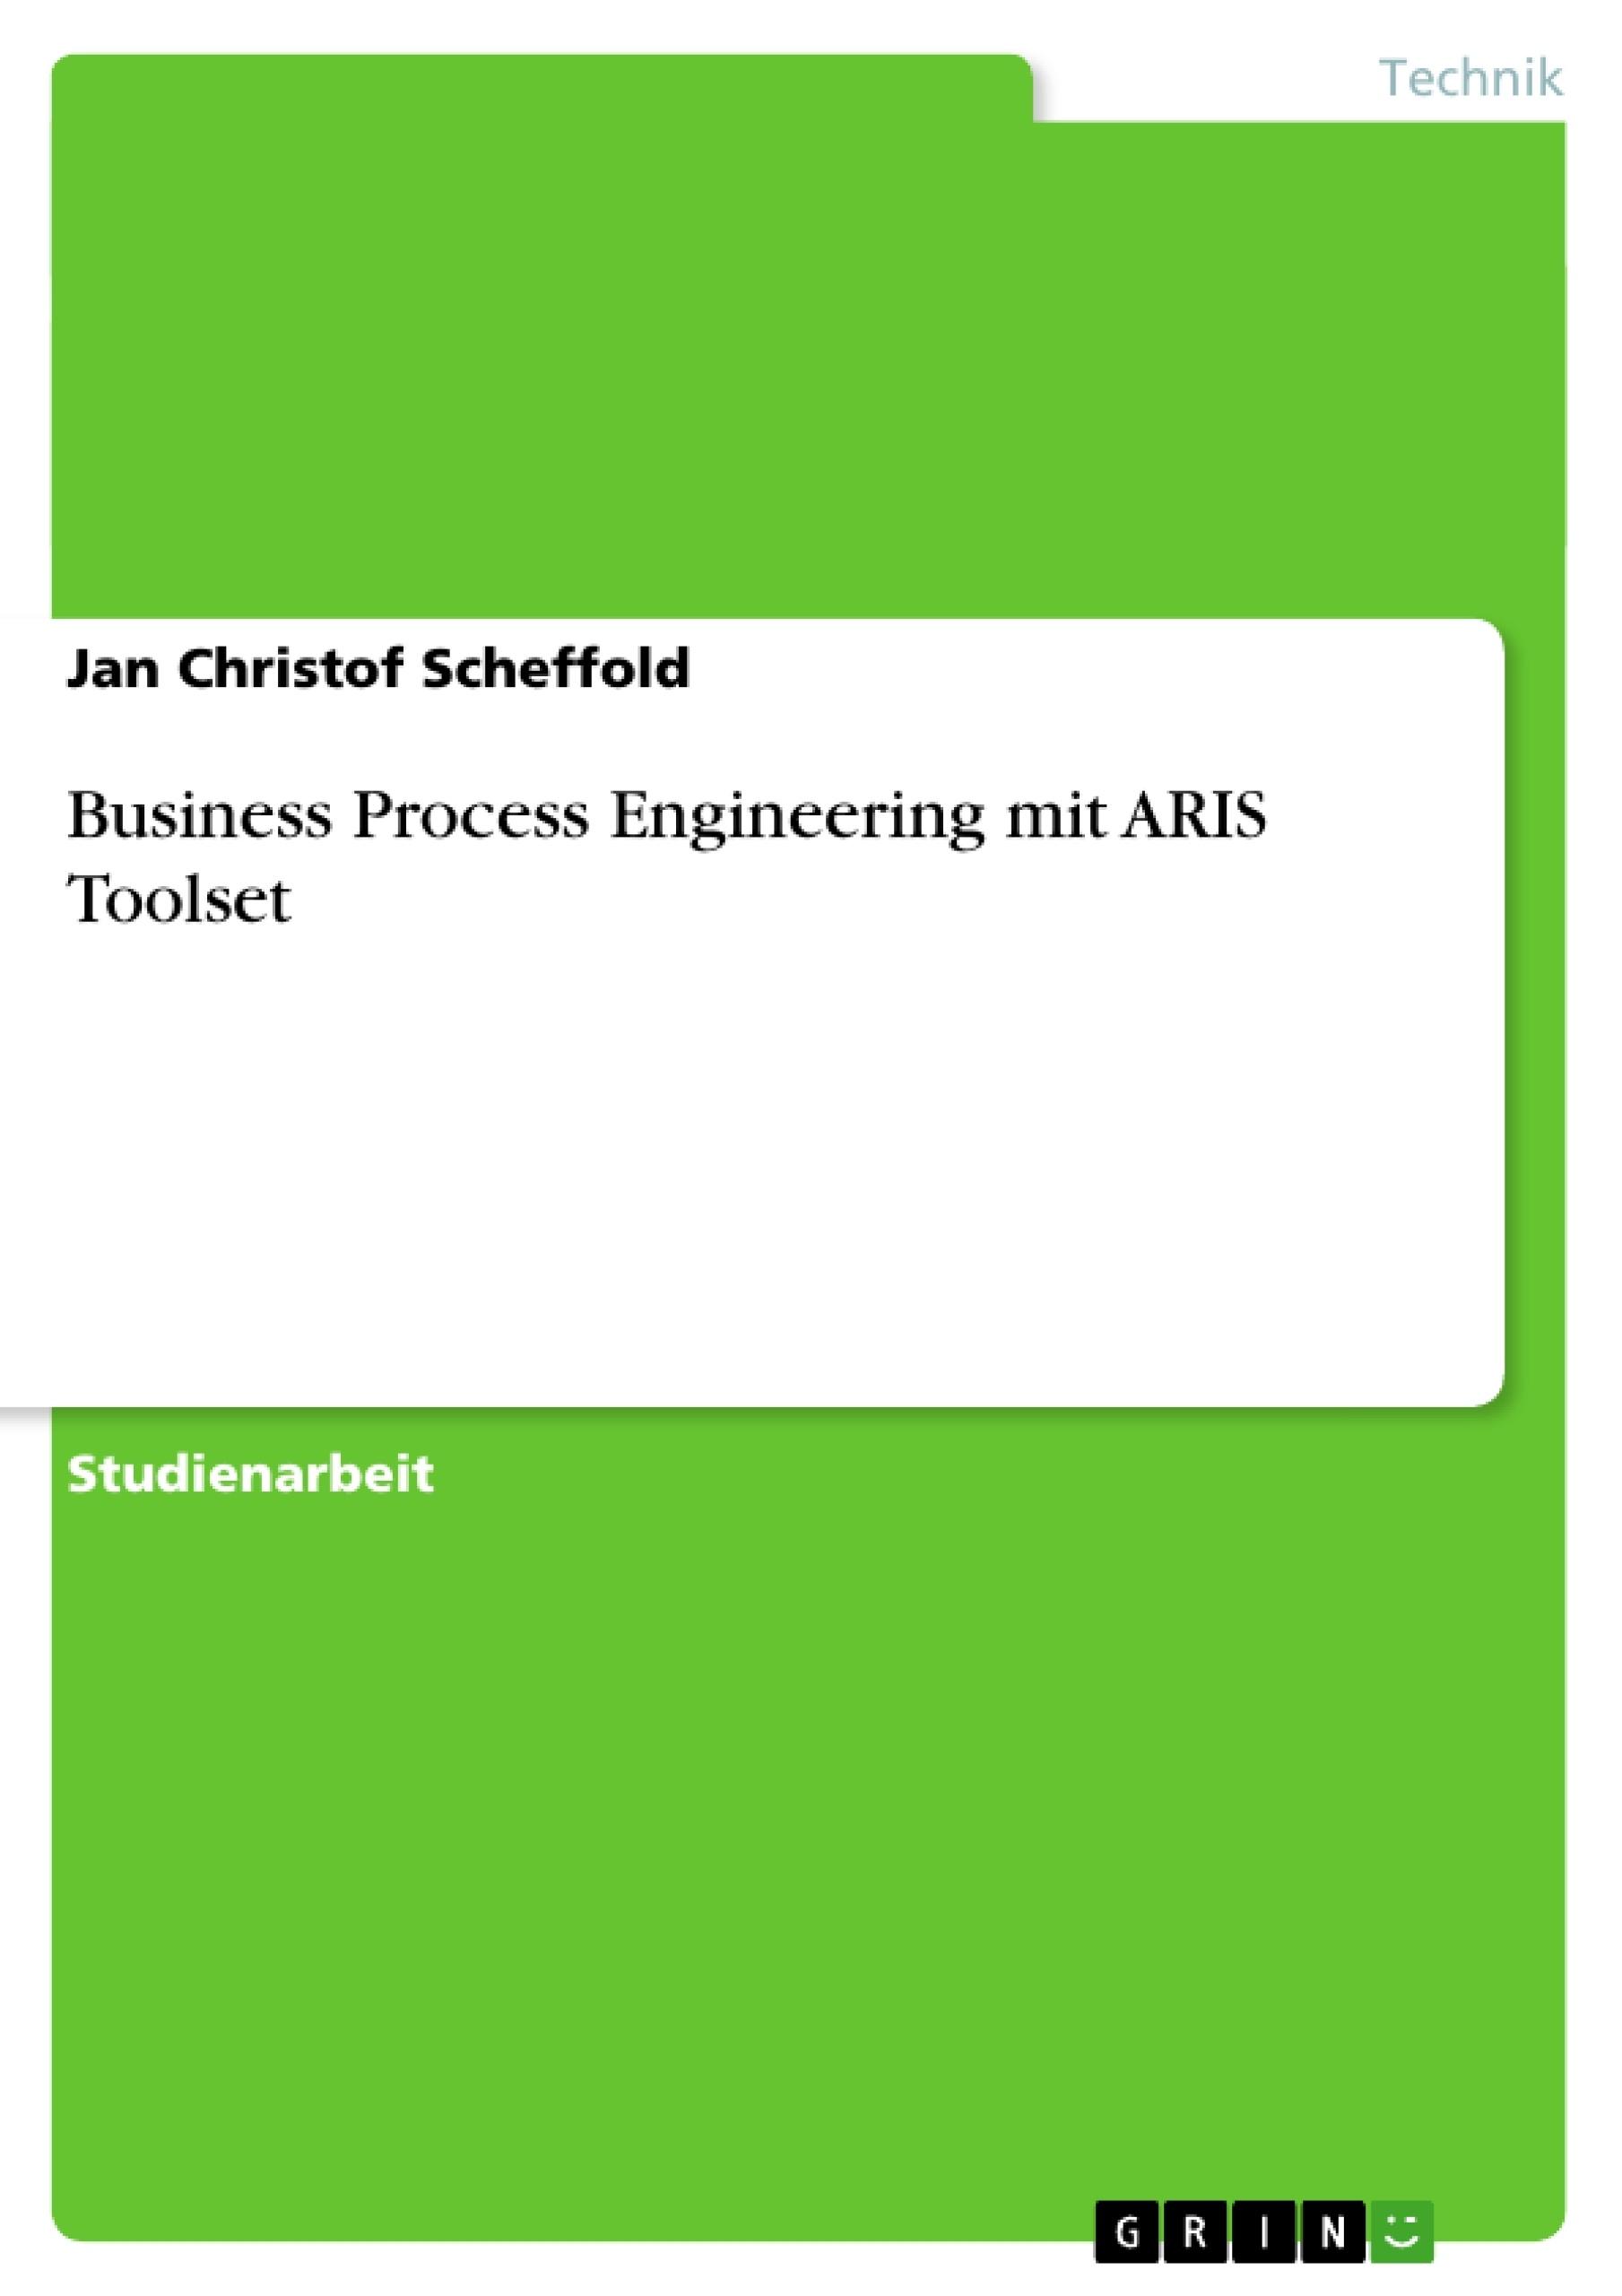 Titel: Business Process Engineering mit ARIS Toolset